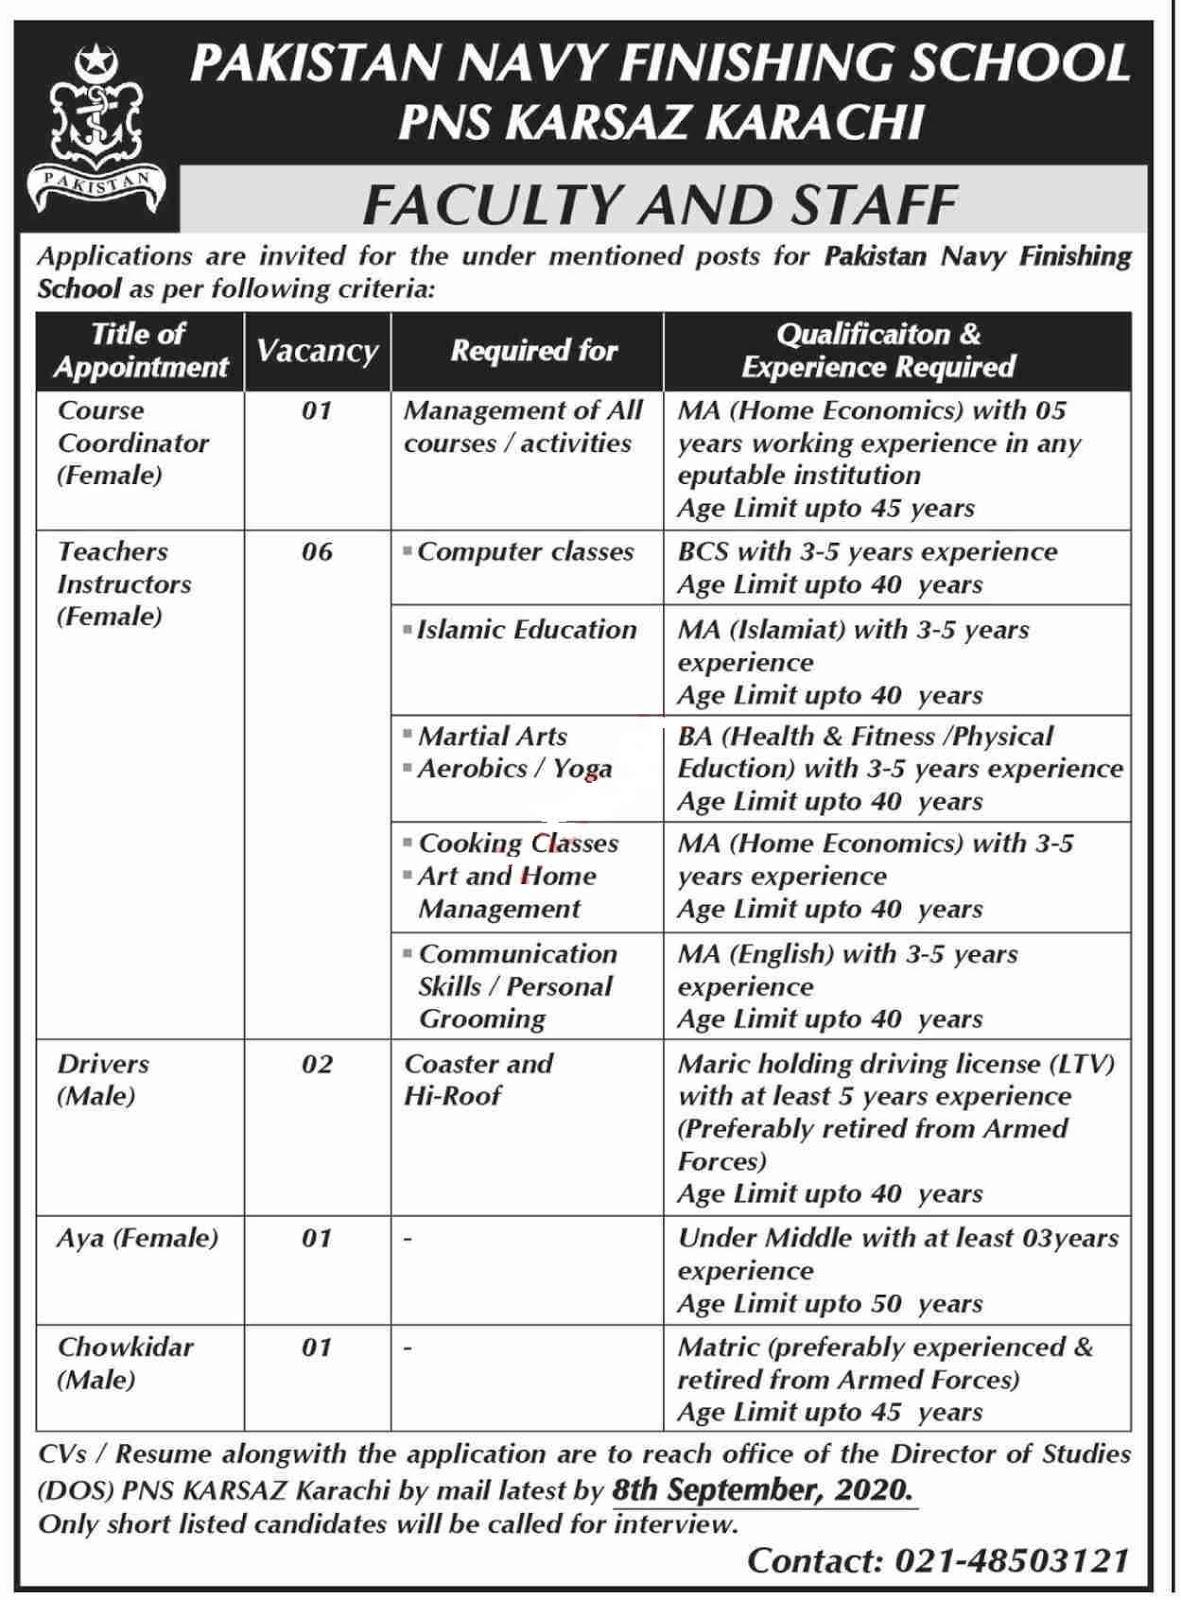 Latest Pakistan Navy Finishing School Education Posts Karachi 2020